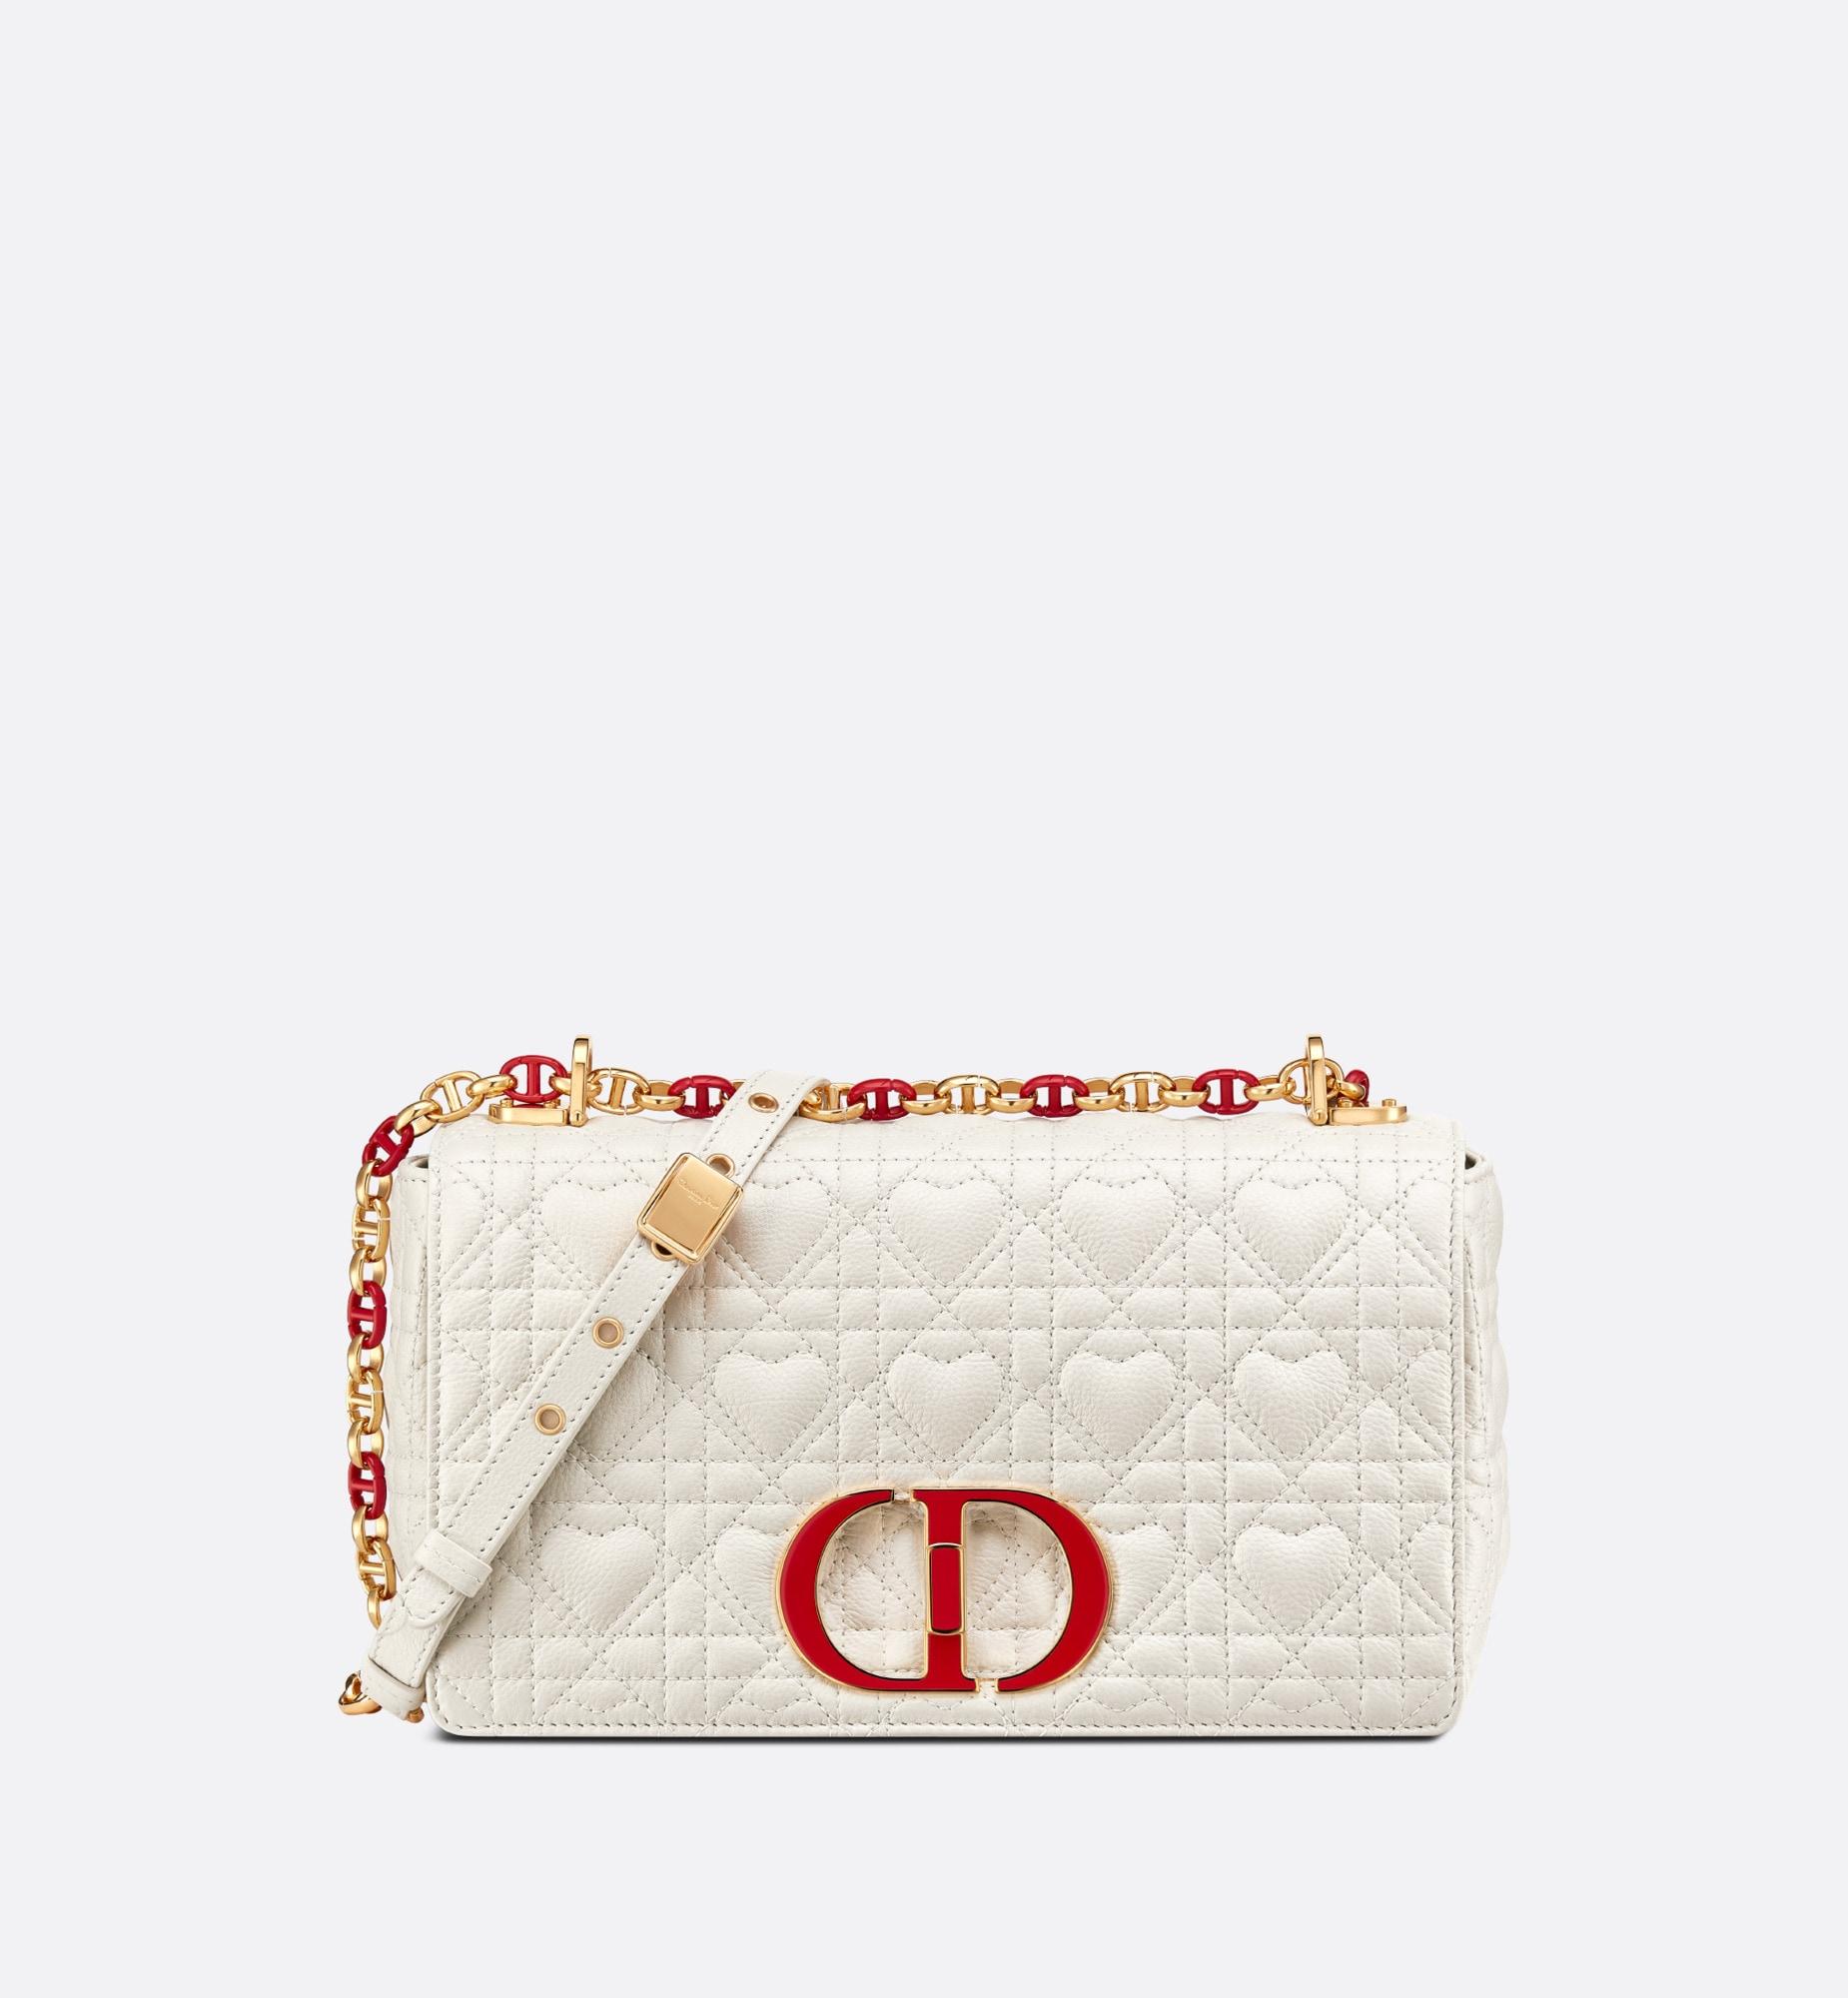 Medium Dioramour Dior Caro Bag Front view